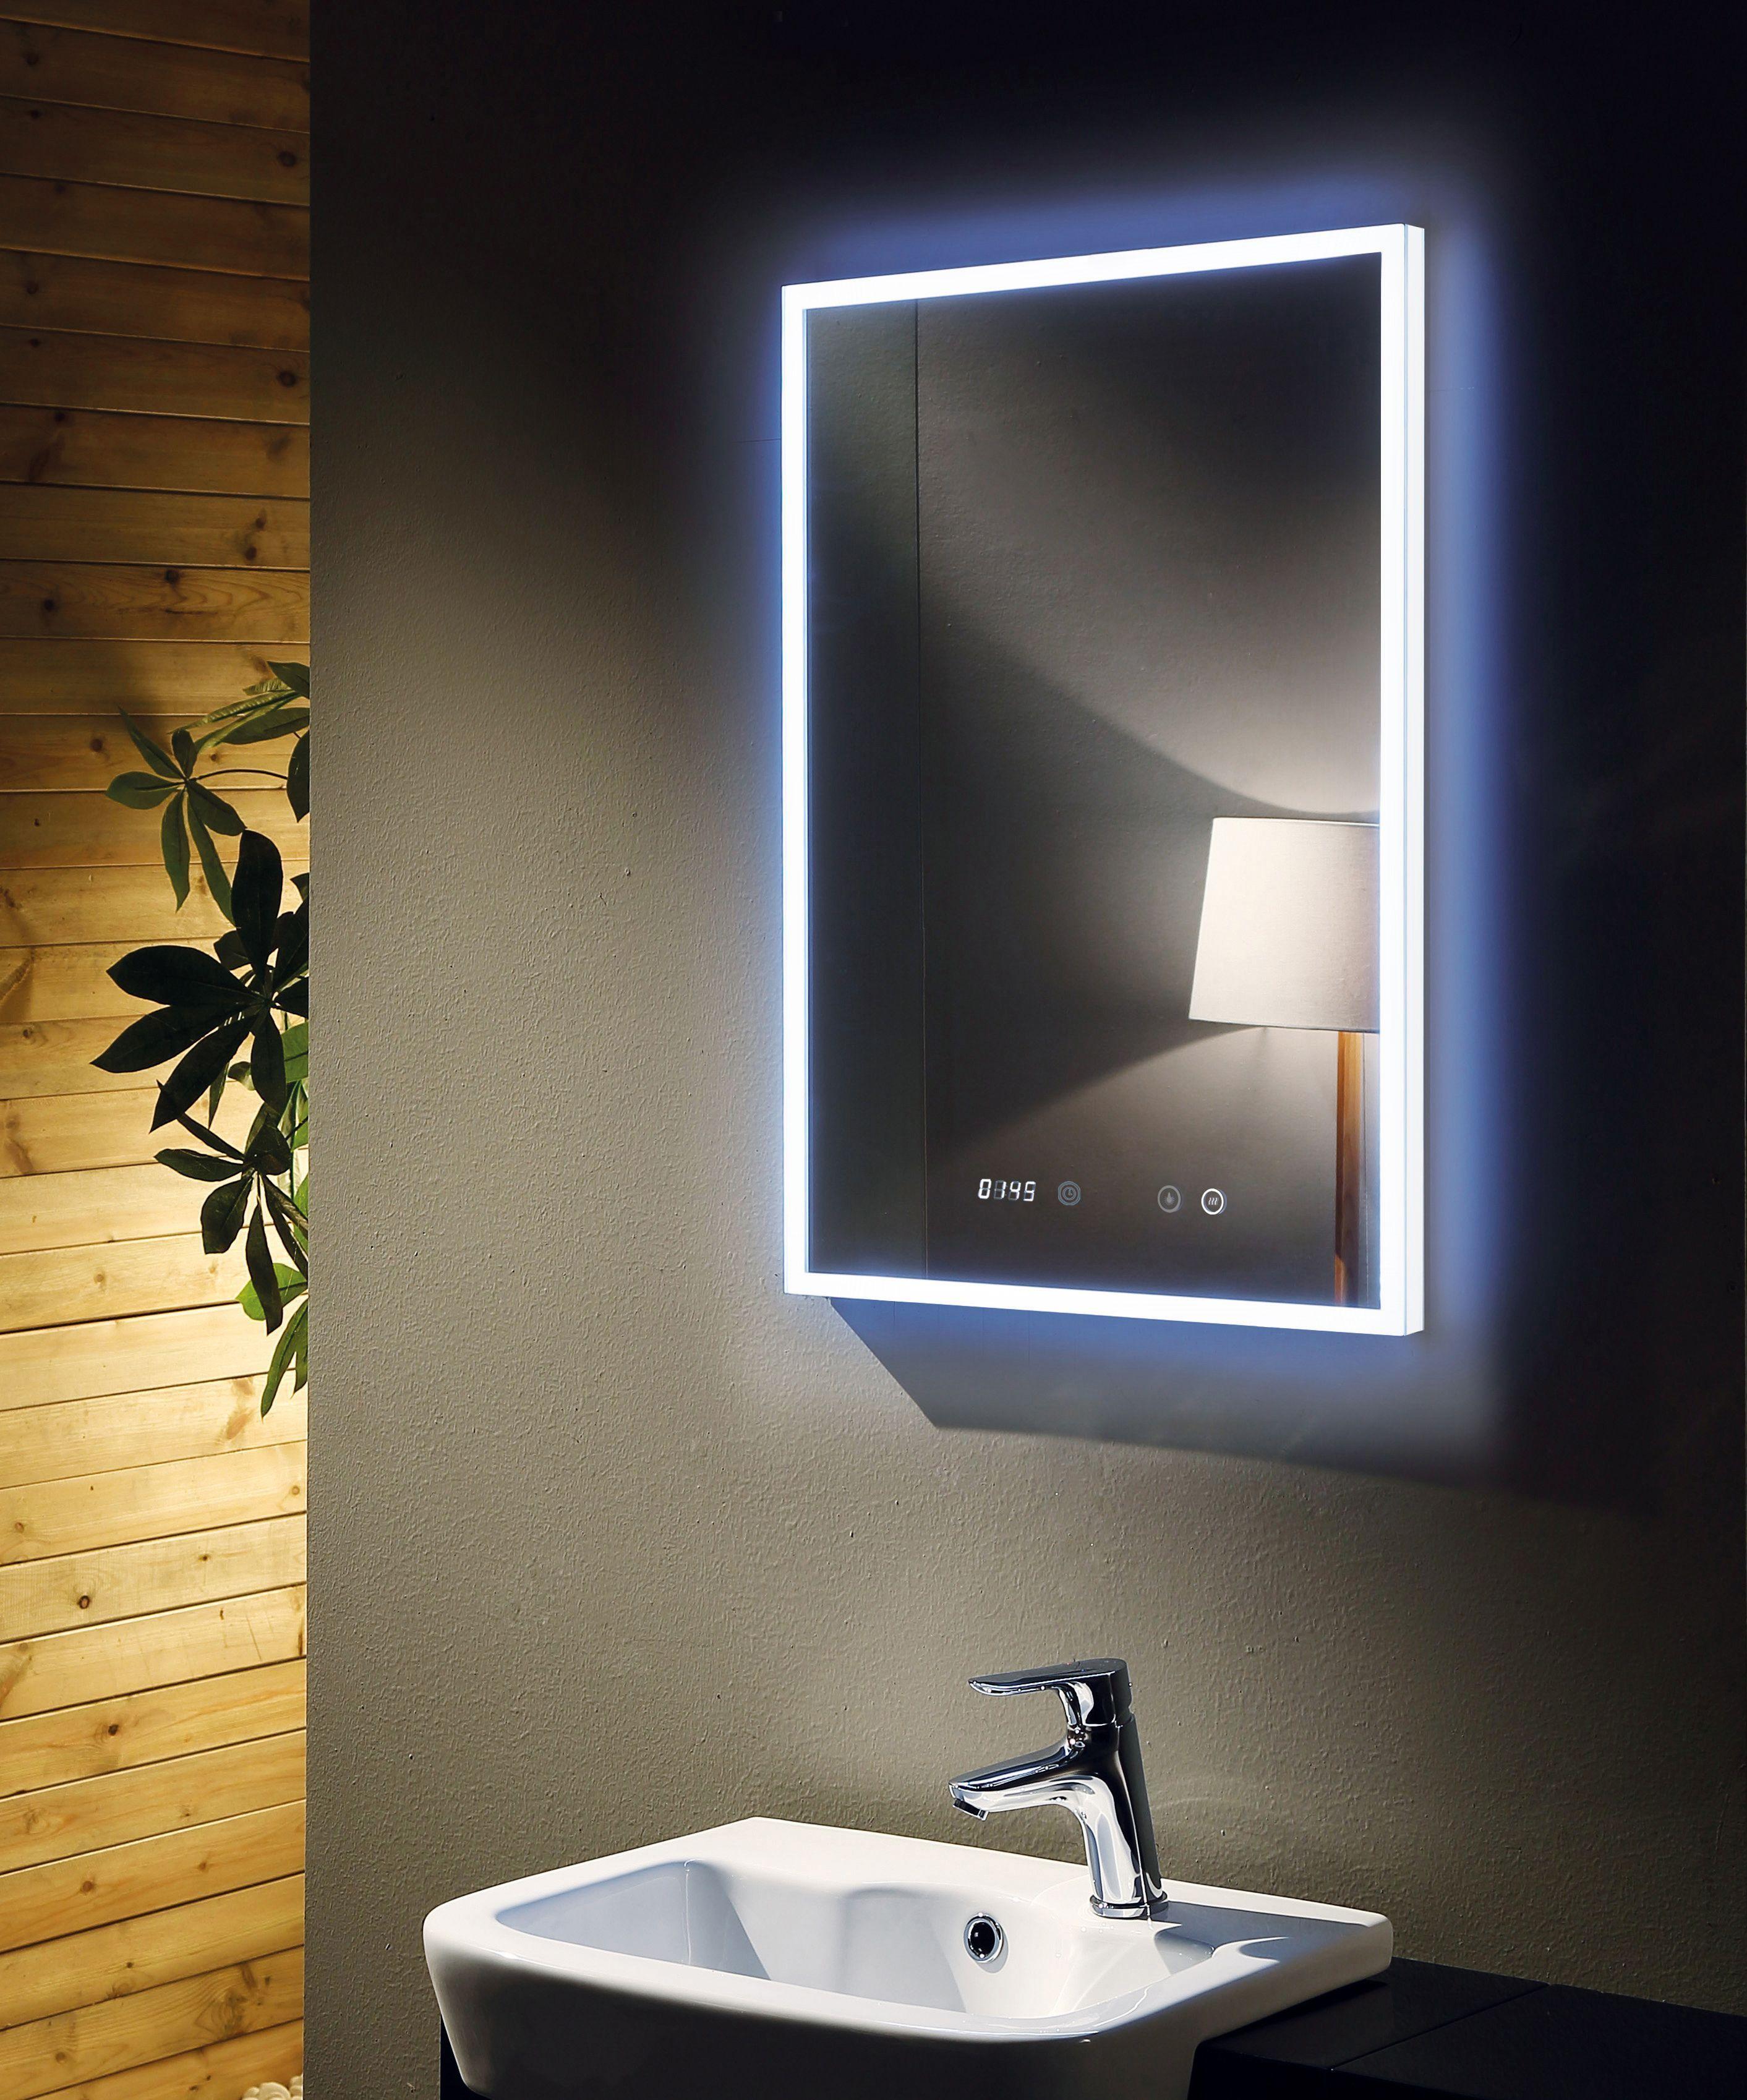 Backlit Mirror Remer Led Mirror Digital Clock Demister Pad Demister Mirror Smart Mirror Light Up A Mirror L Bathroom Mirror Elegant Bathroom Led Mirror